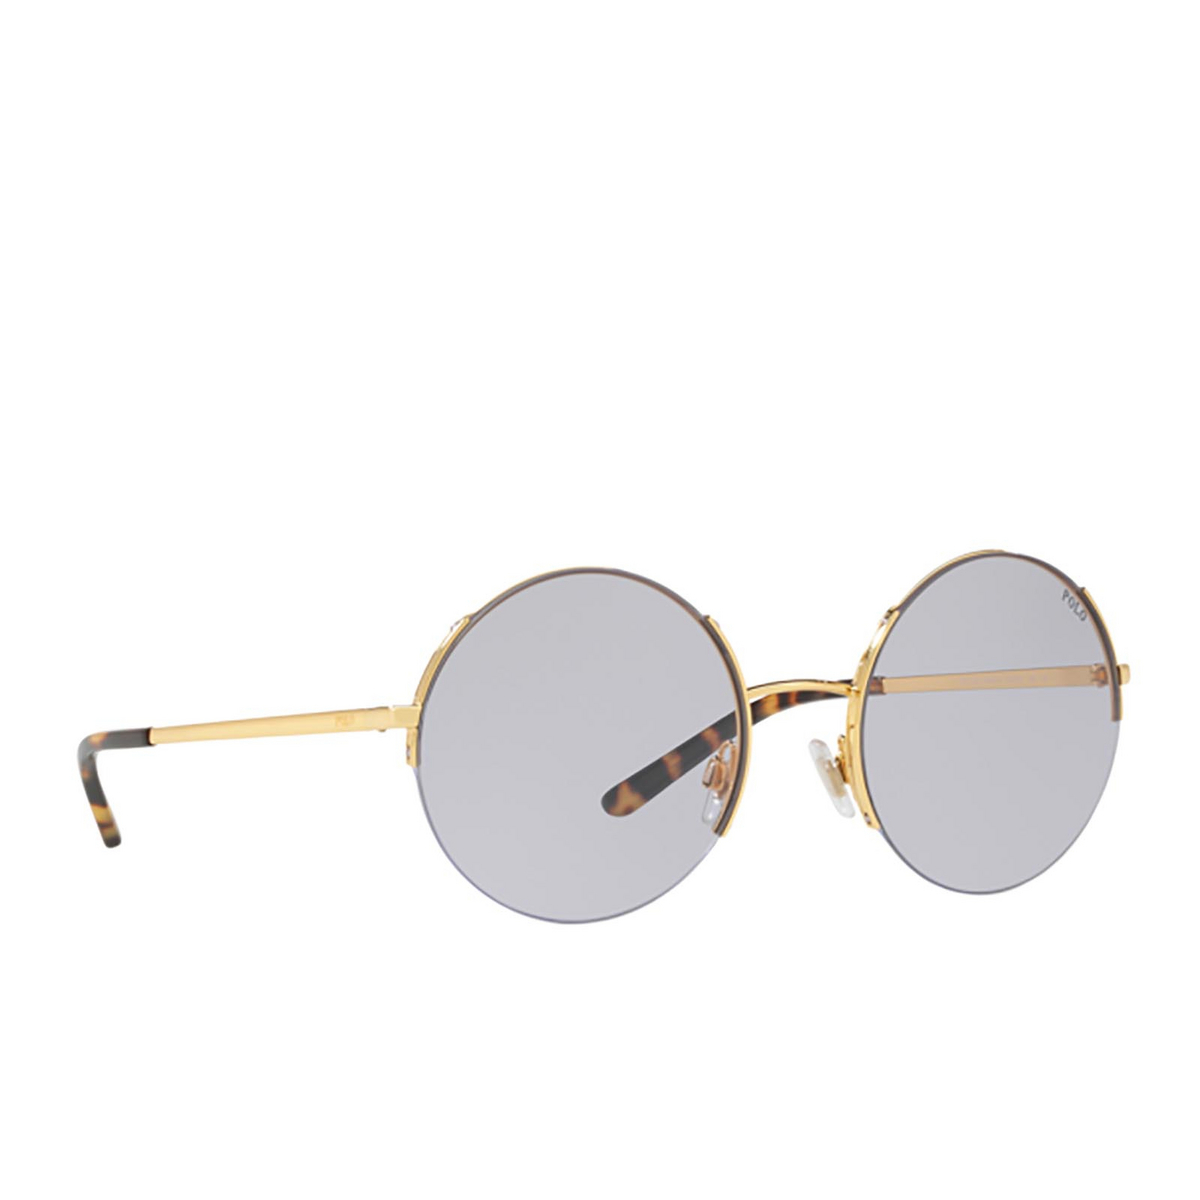 Polo Ralph Lauren® Round Sunglasses: PH3120 color Gold 90041A - three-quarters view.